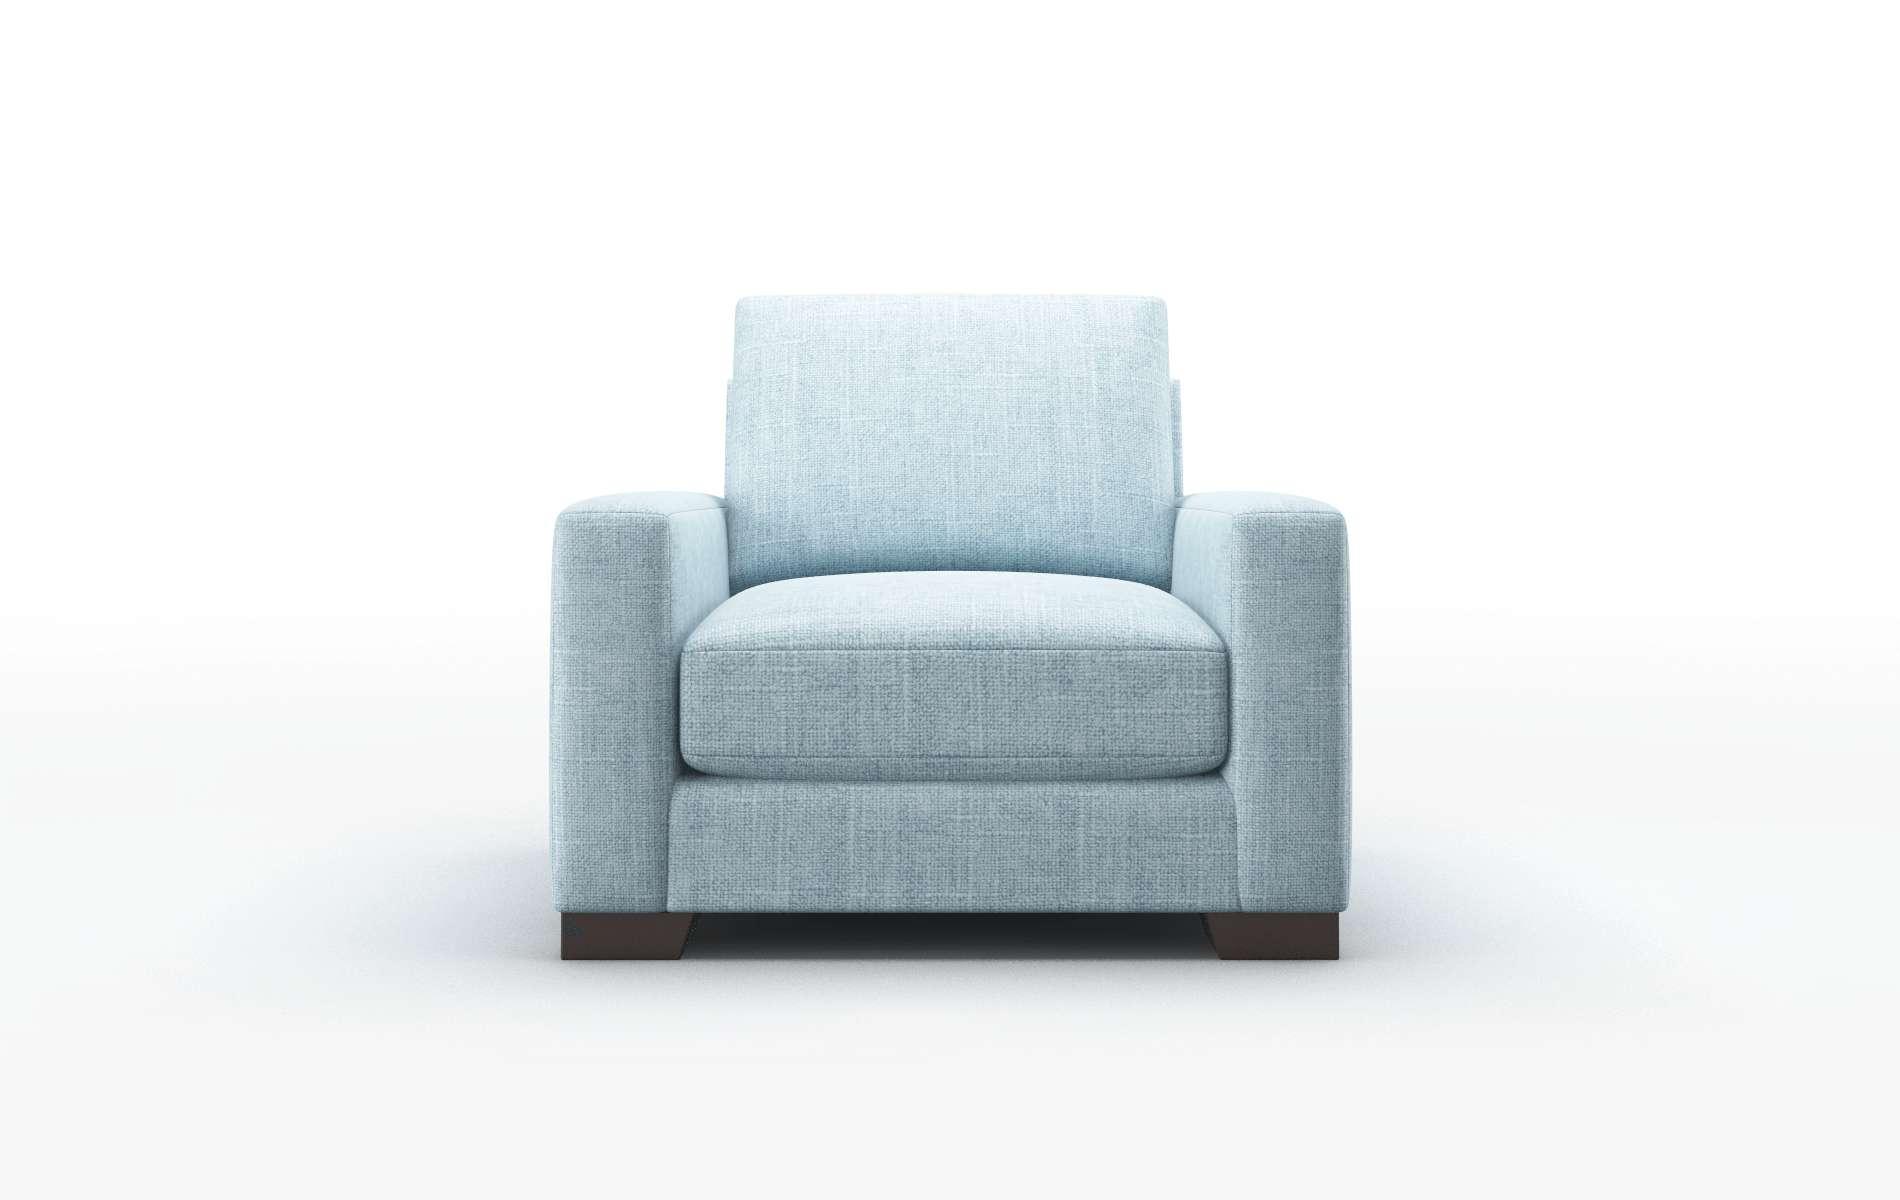 London Atlas Turquoise Chair espresso legs 1